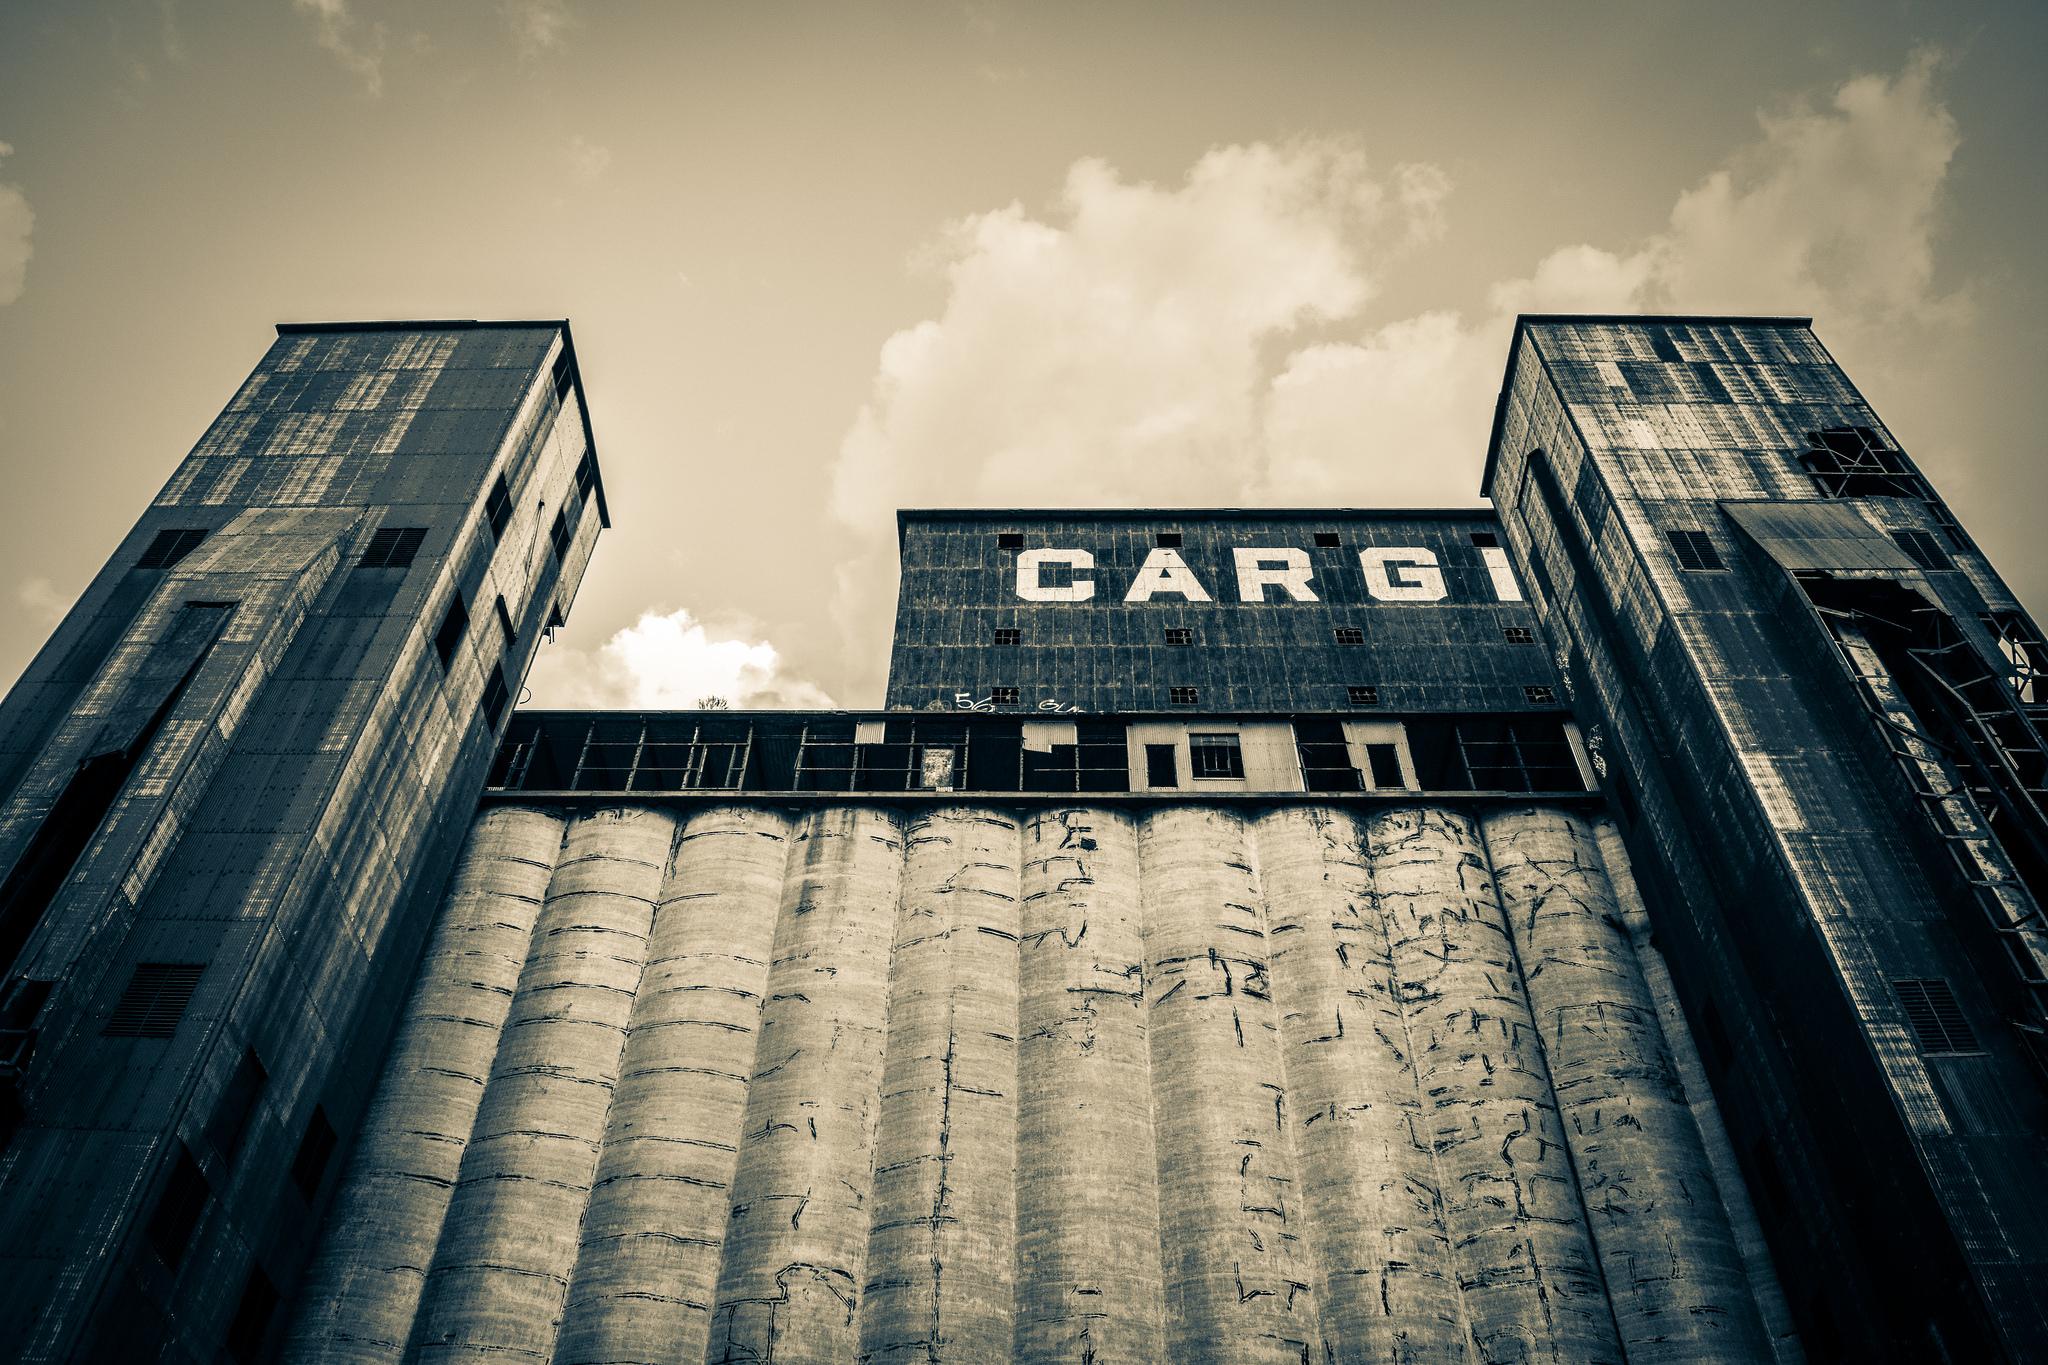 Grain elevator or Buffalo castle?